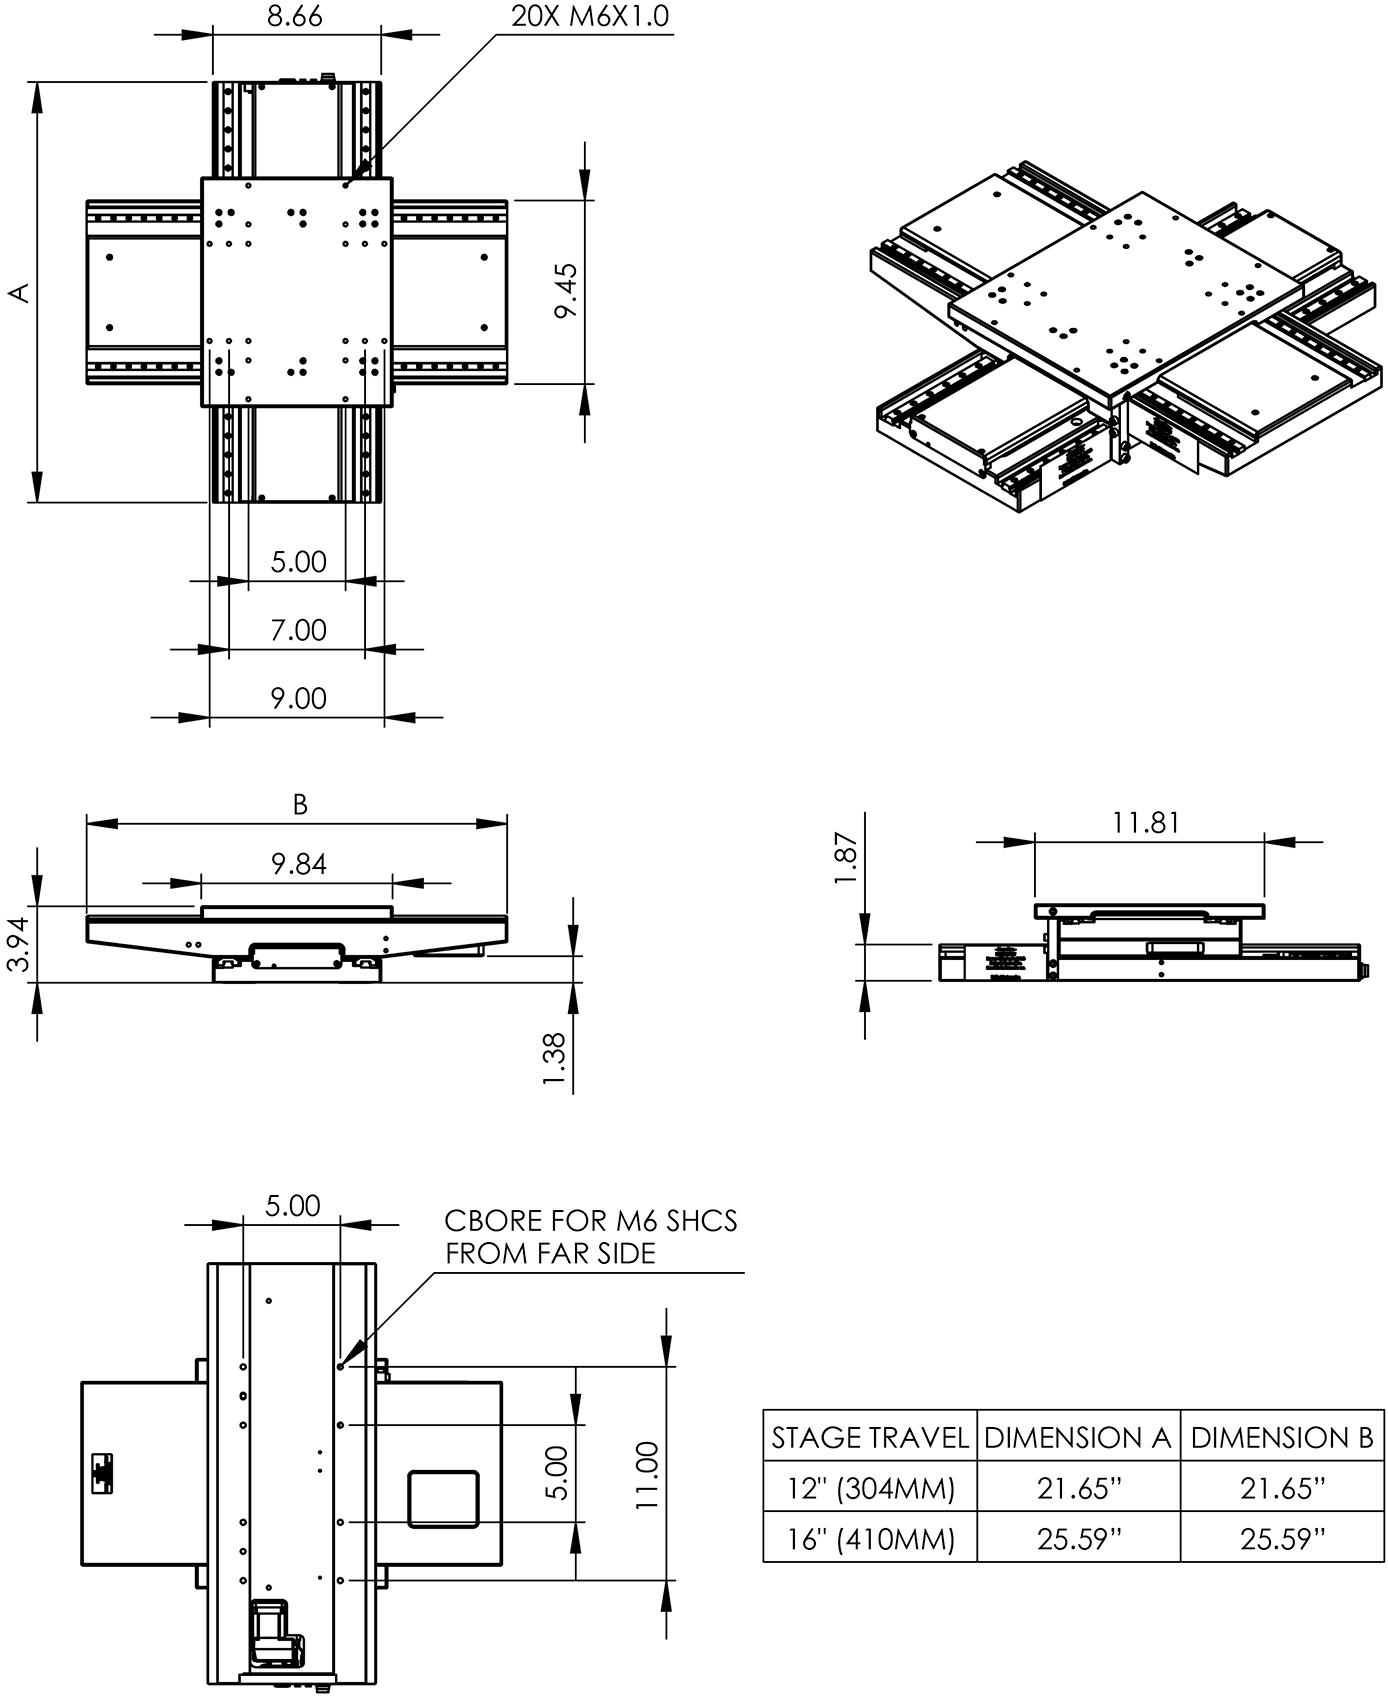 LP300E & LP400E XY Stage Dimension Drawings